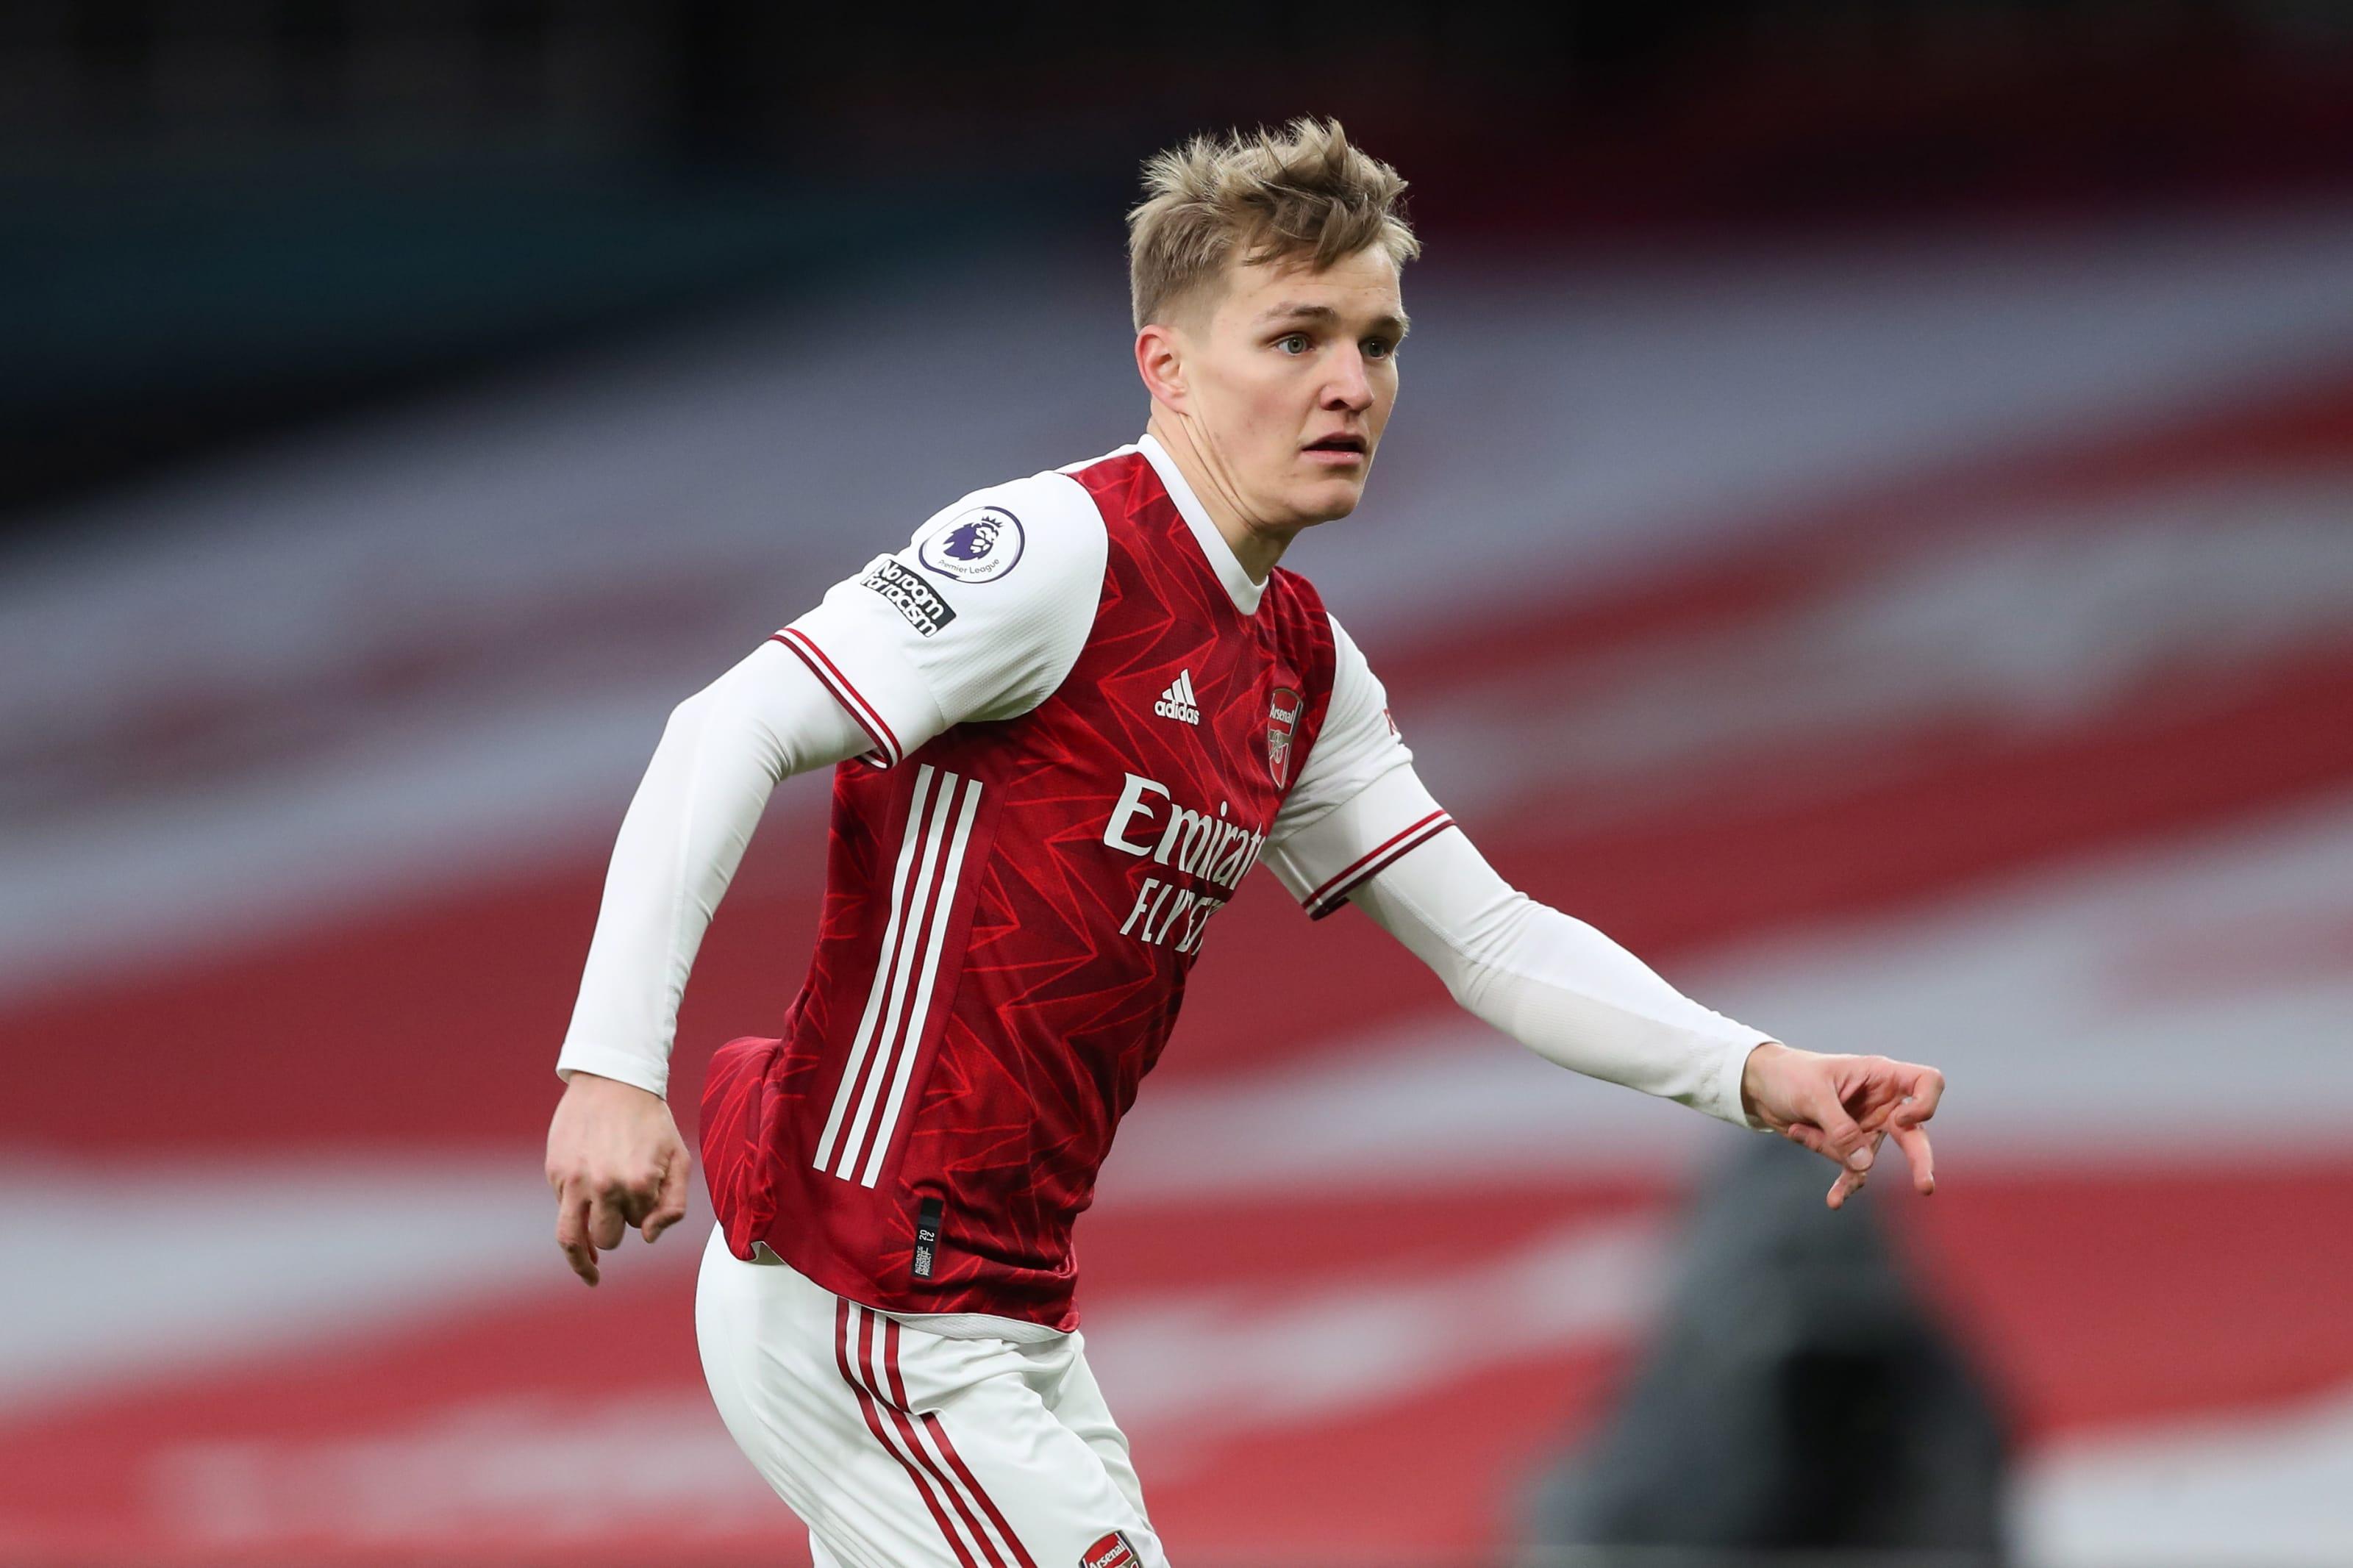 Arsenal have £50m transfer fear as discount Martin Odegaard alternative emerges - Bóng Đá